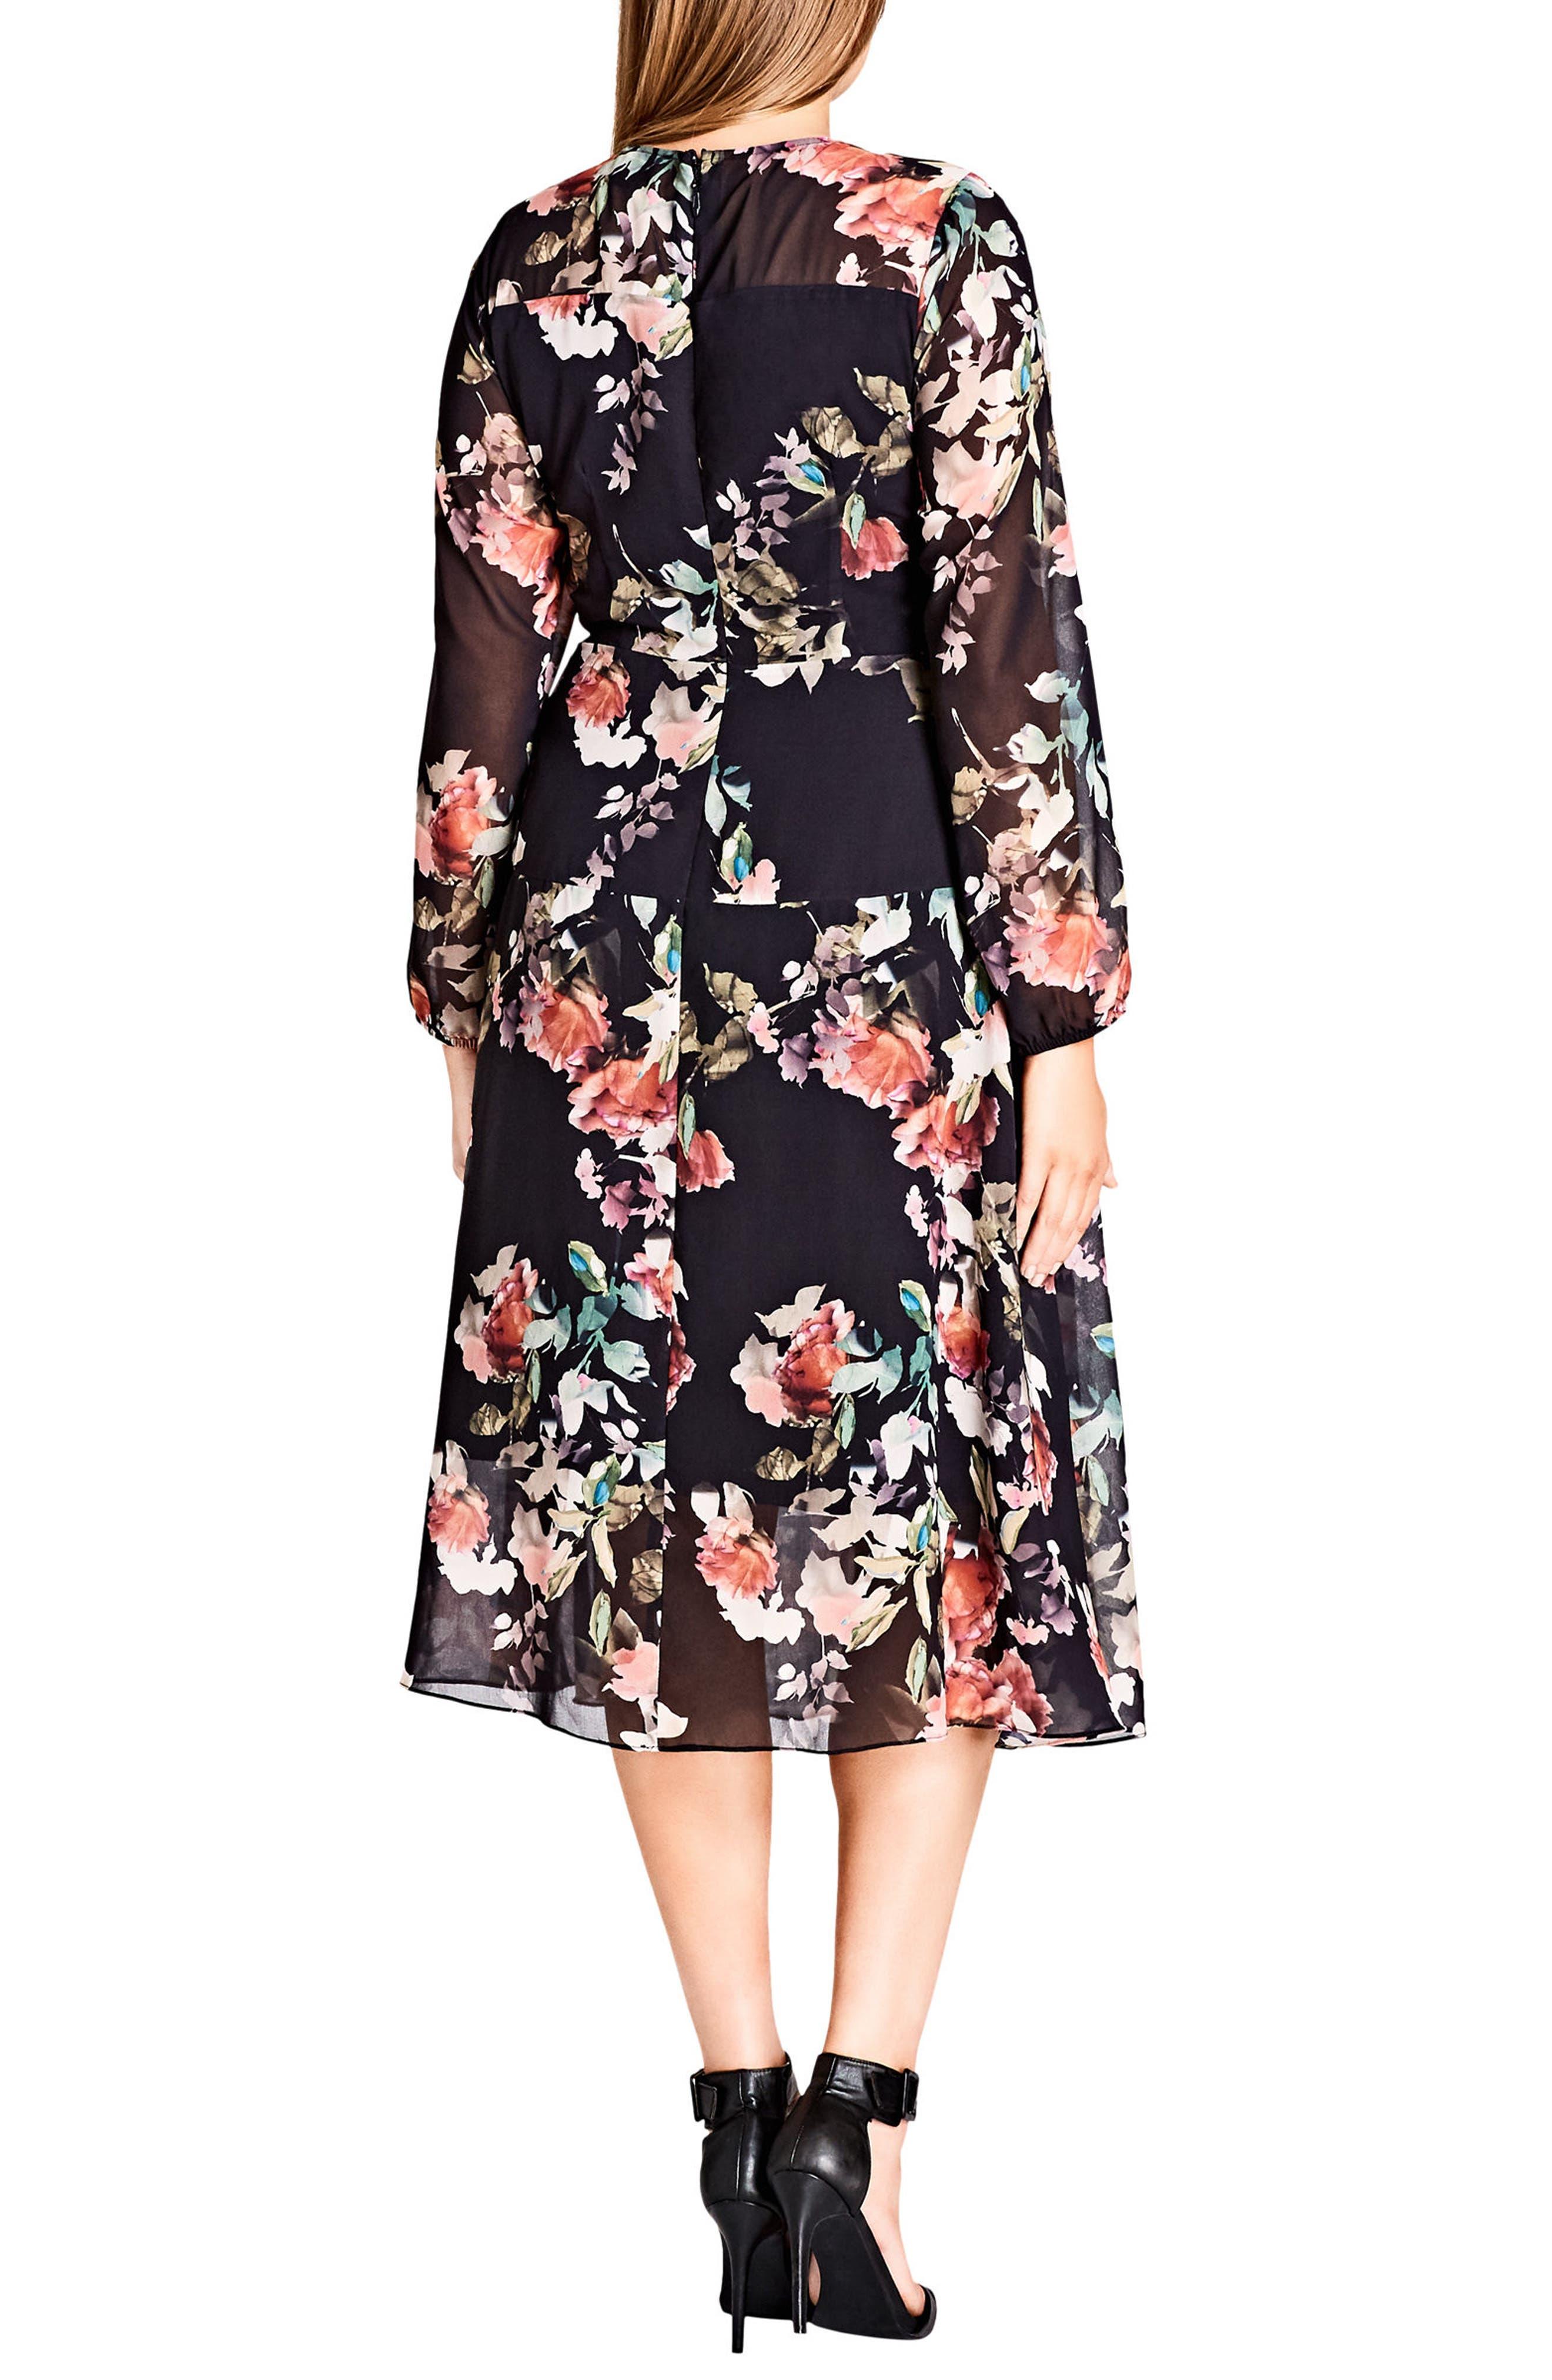 CITY CHIC,                             Sheer Divine Floral Print Midi Dress,                             Alternate thumbnail 2, color,                             001